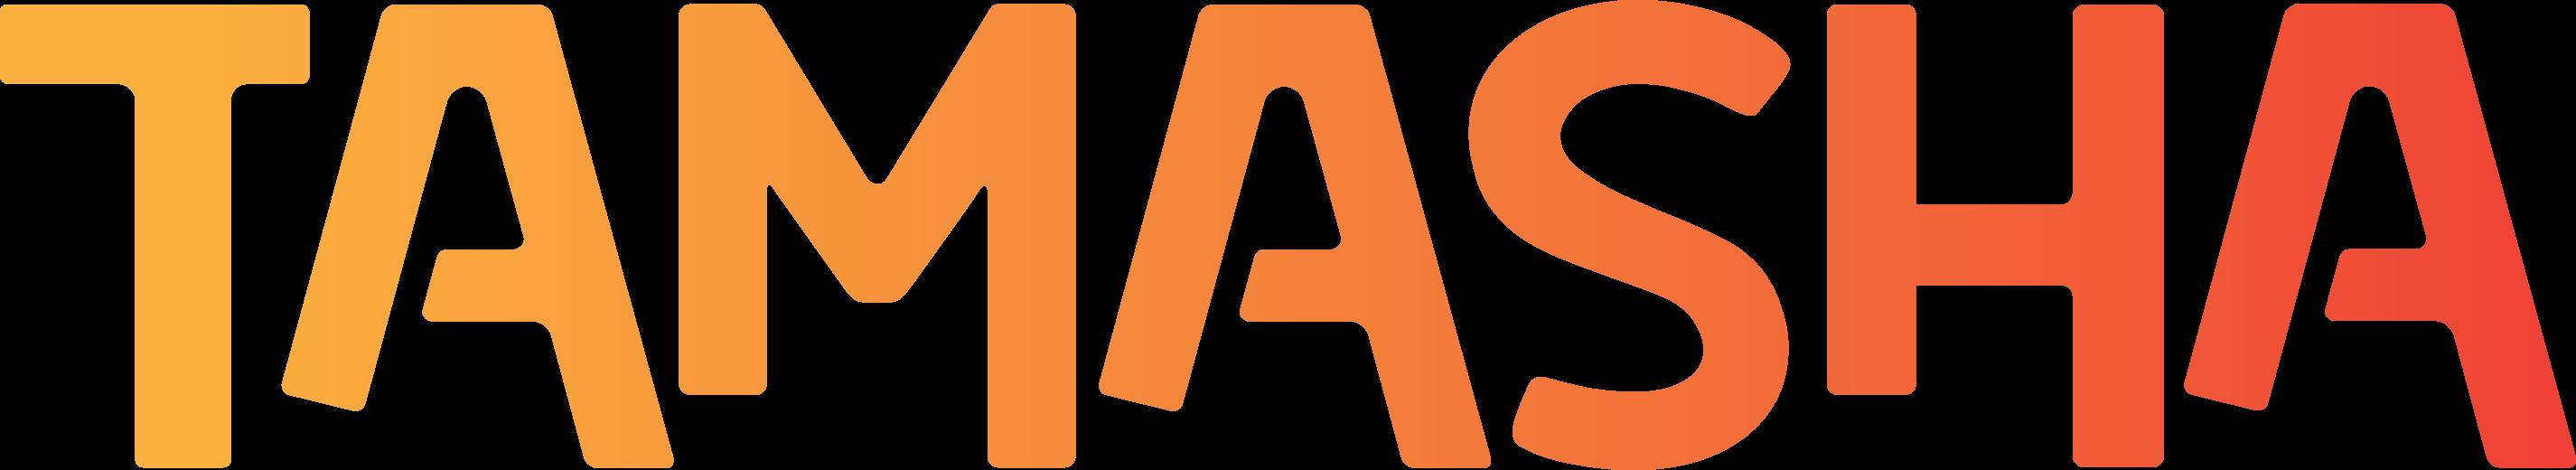 Tamasha_master_logo_Colour_fade (1)